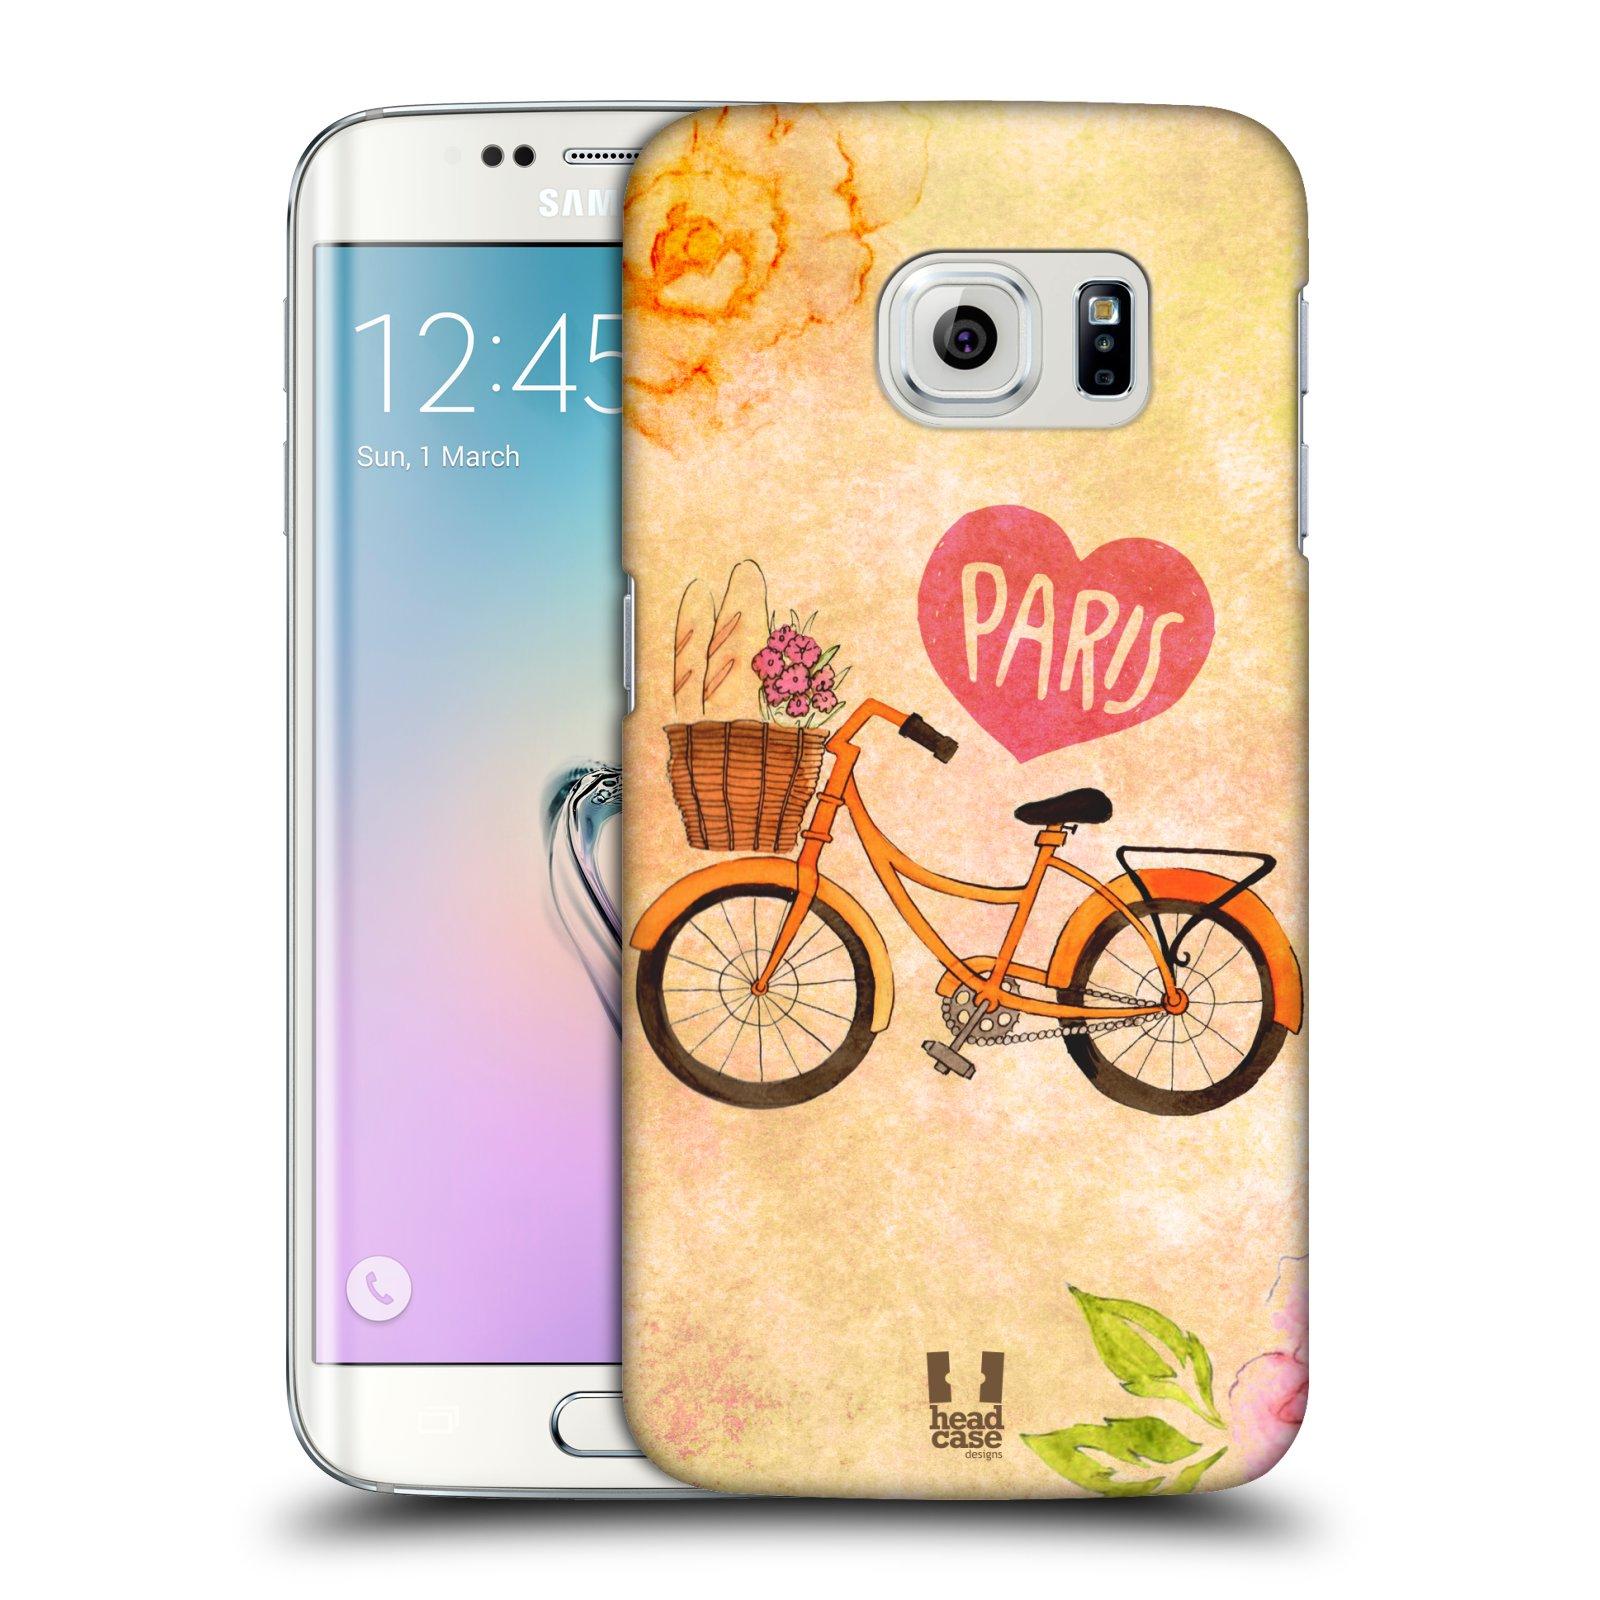 Plastové pouzdro na mobil Samsung Galaxy S6 Edge HEAD CASE PAŘÍŽ NA KOLE (Kryt či obal na mobilní telefon Samsung Galaxy S6 Edge SM-G925F)